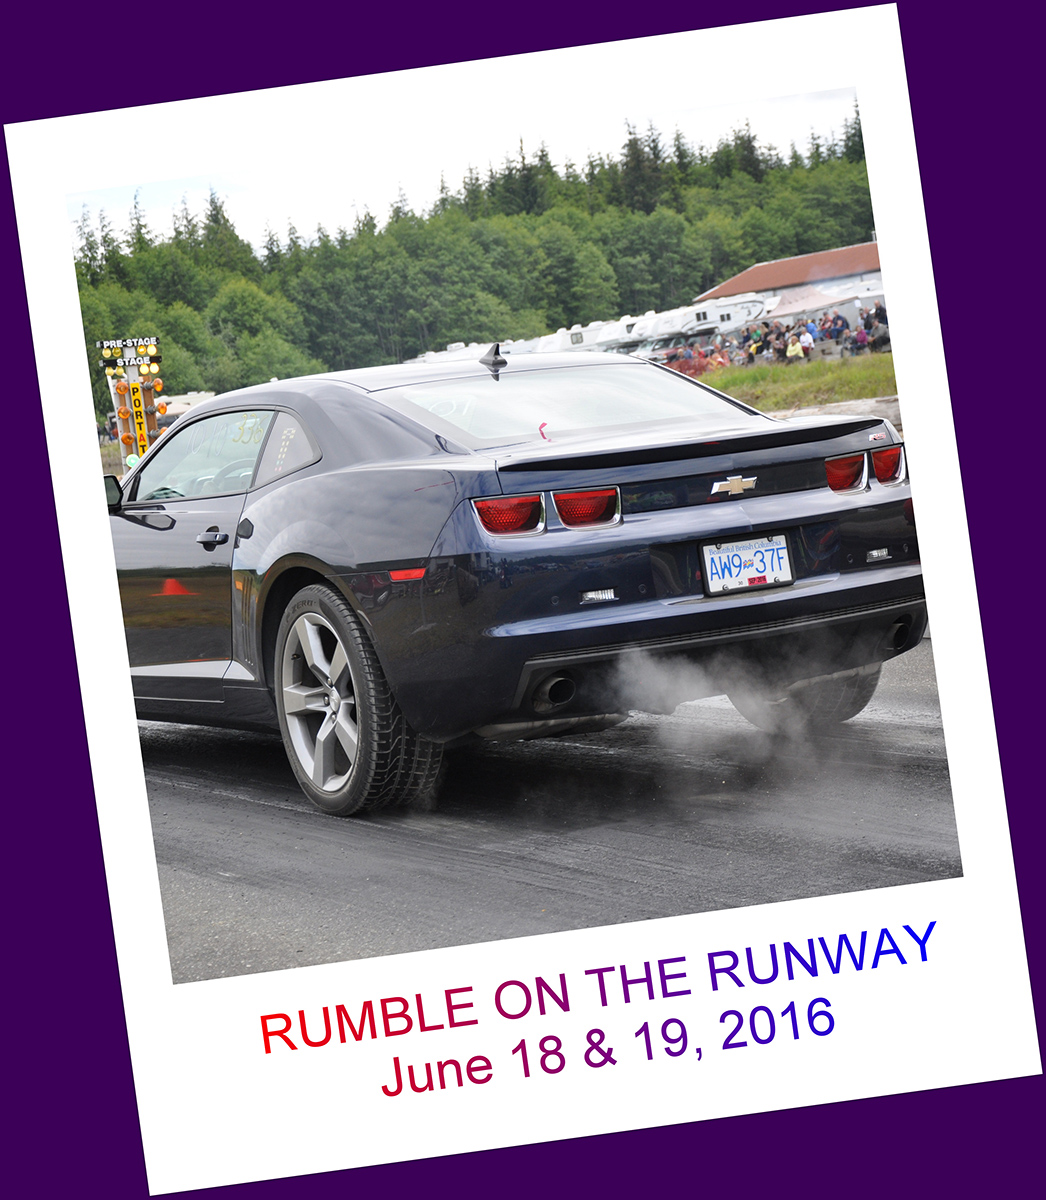 Rumble on the Runway June 18 & 19, 2016 539